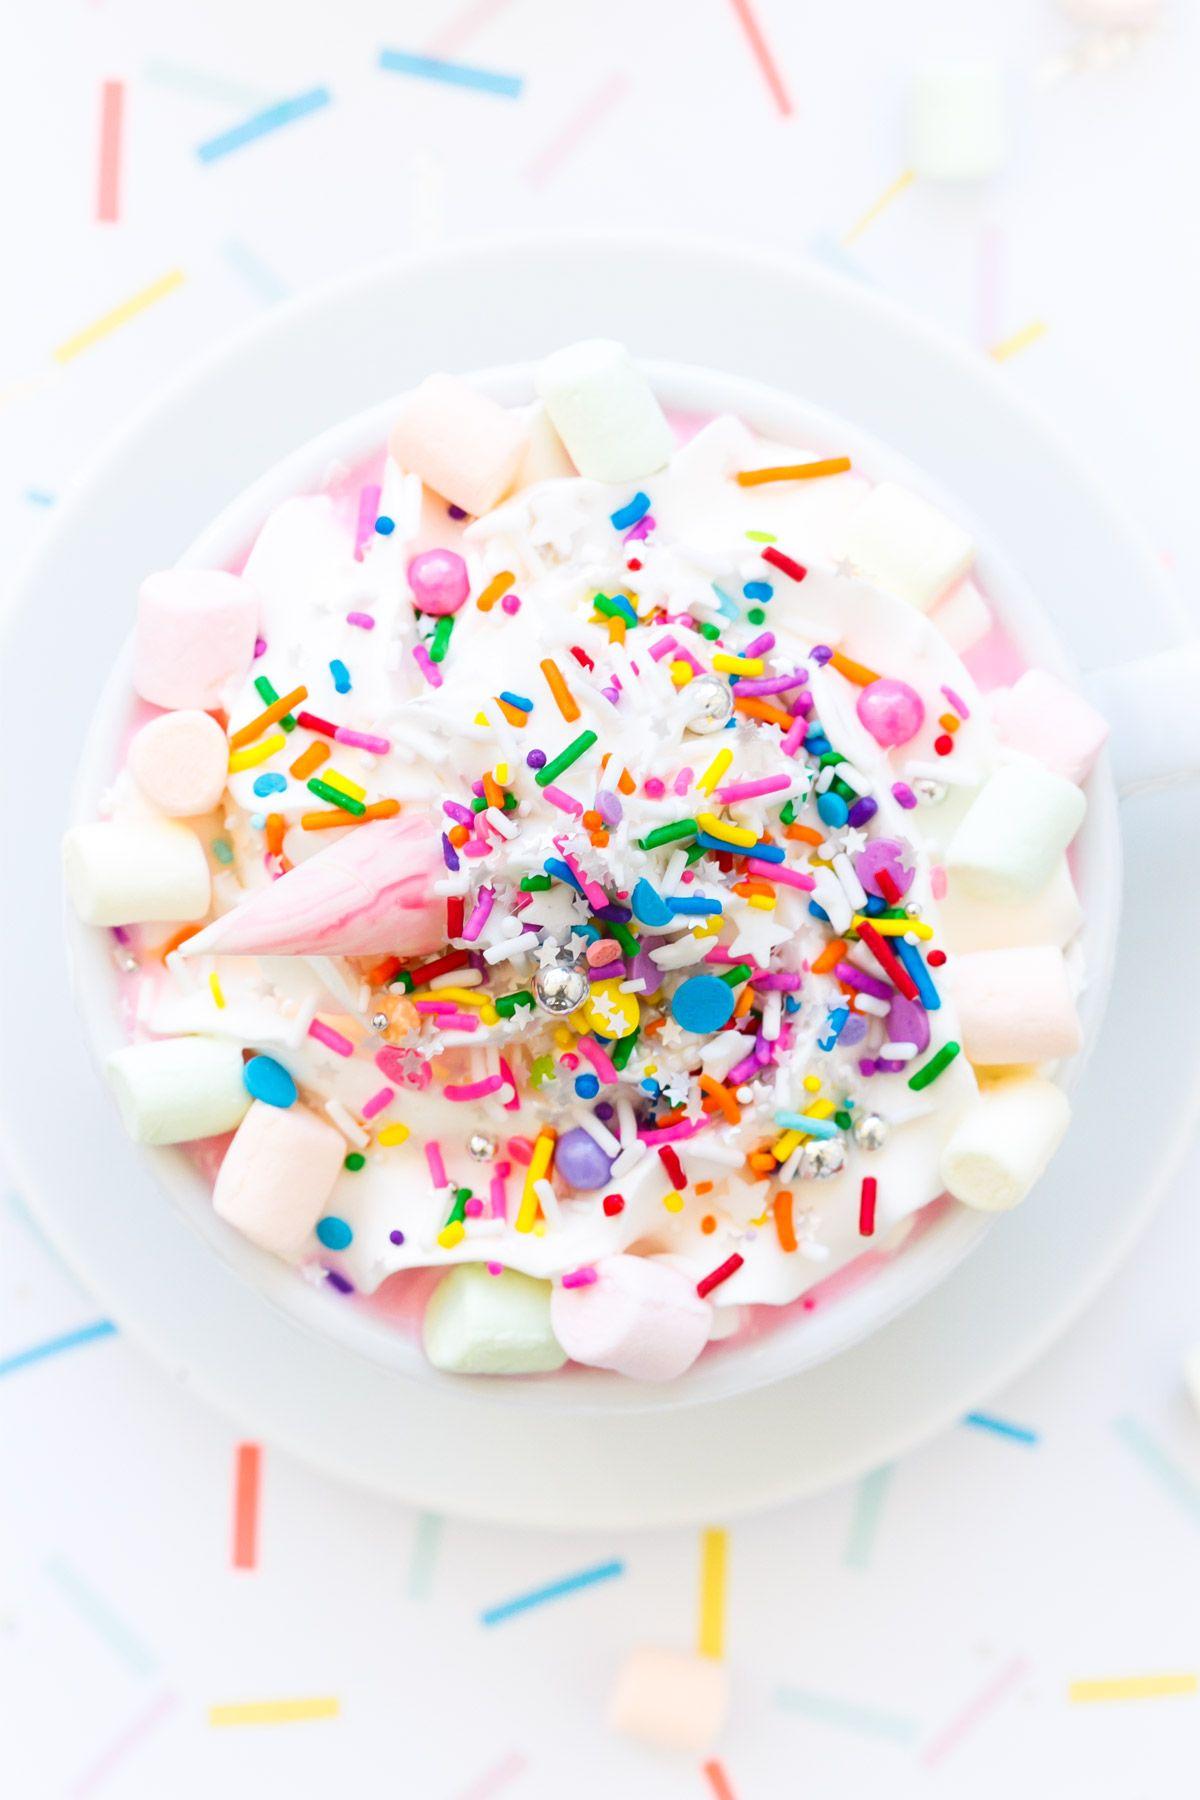 Copycat Unicorn Hot Chocolate Recipe